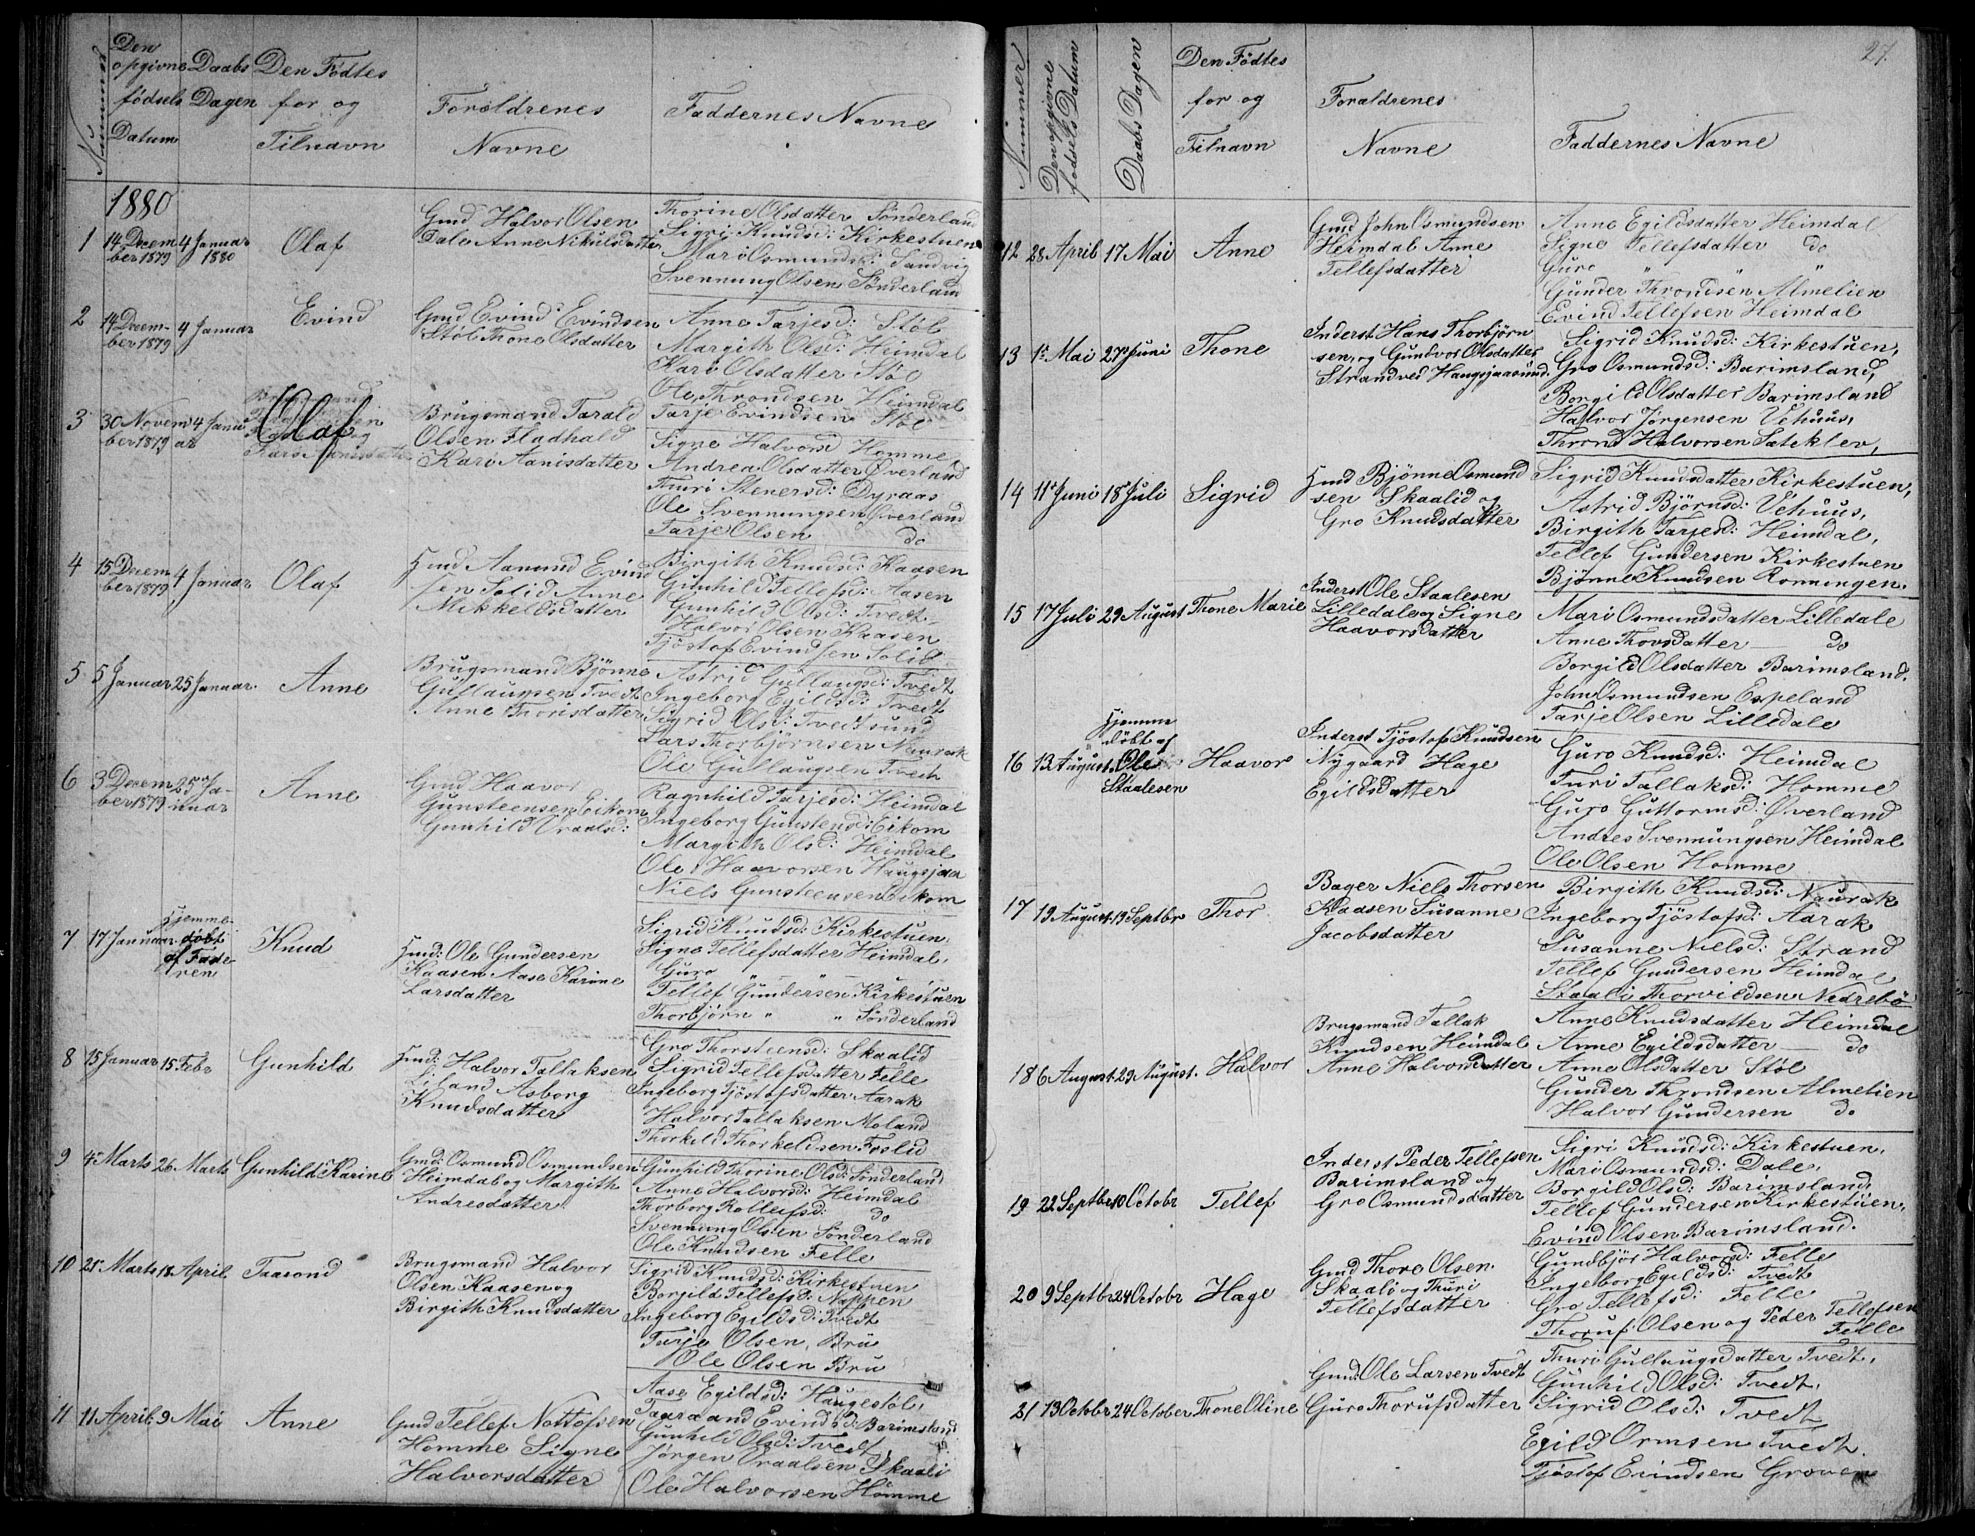 SAKO, Nissedal kirkebøker, G/Gb/L0002: Klokkerbok nr. II 2, 1863-1892, s. 27